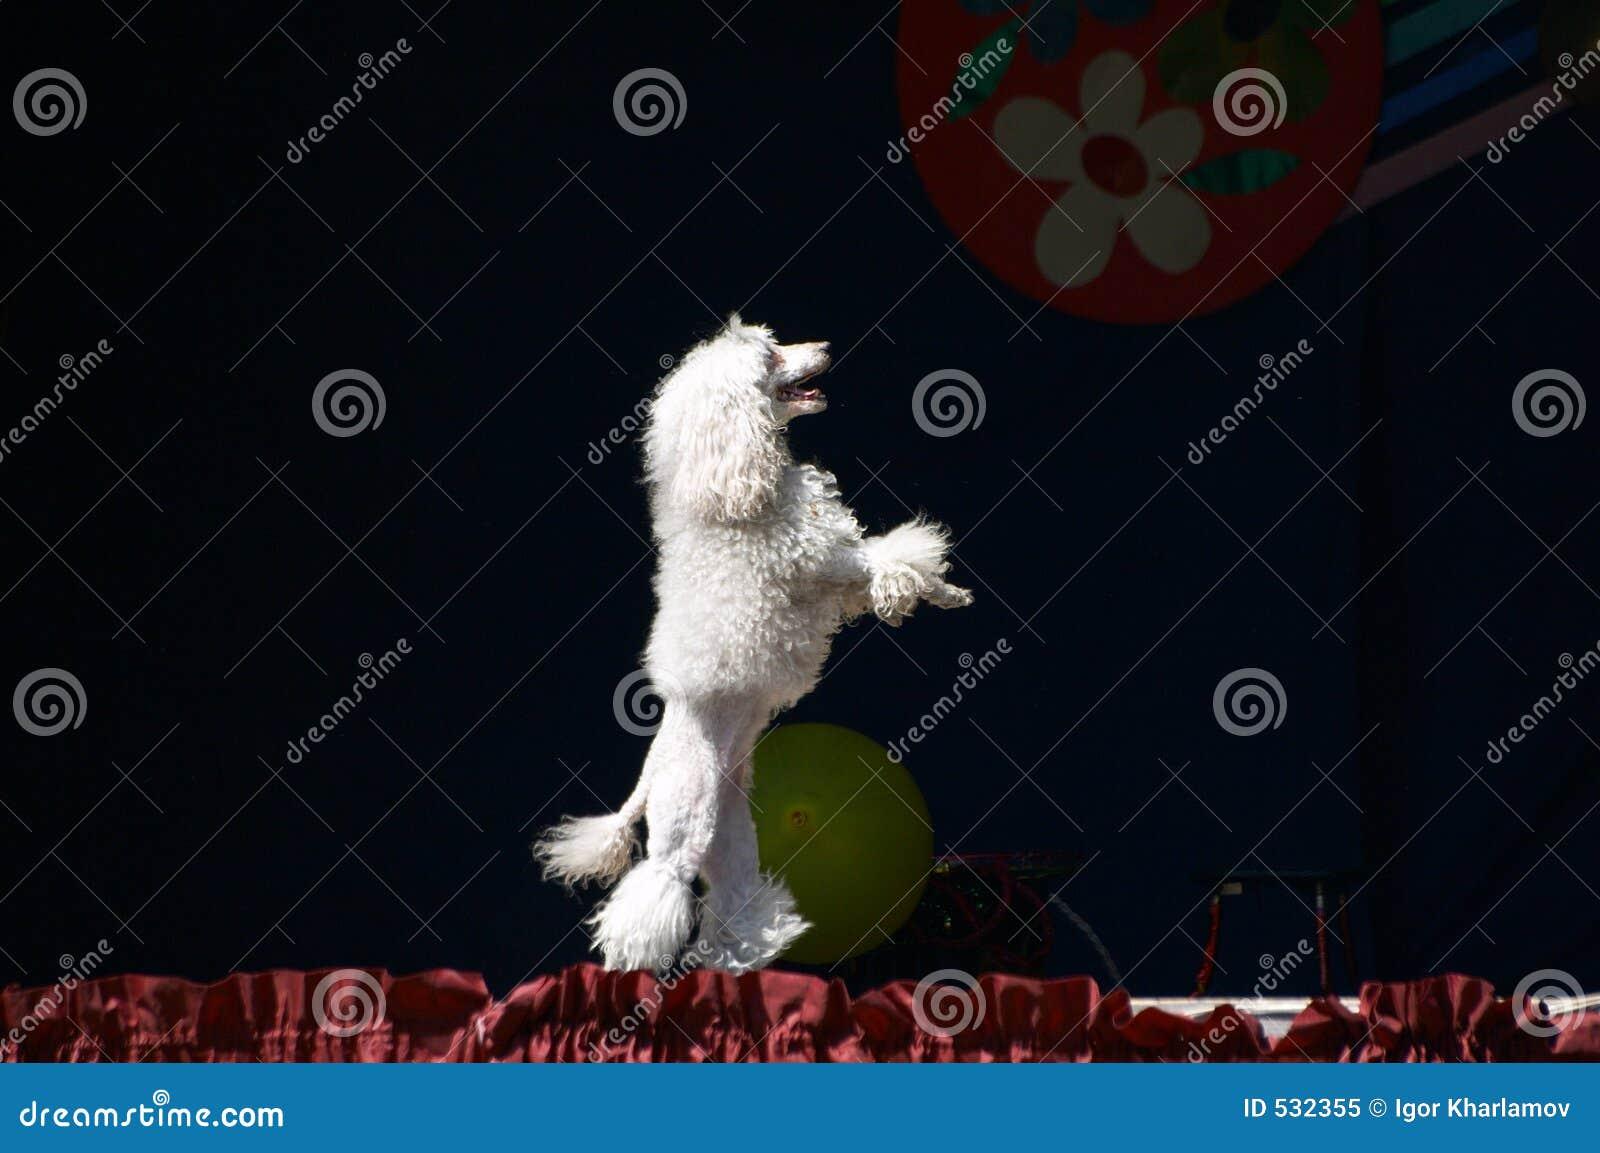 Download 长卷毛狗白色 库存图片. 图片 包括有 交配动物者, 长卷毛狗, 忠诚度, 守纪, 显示, 心房, 小狗, 关闭 - 532355